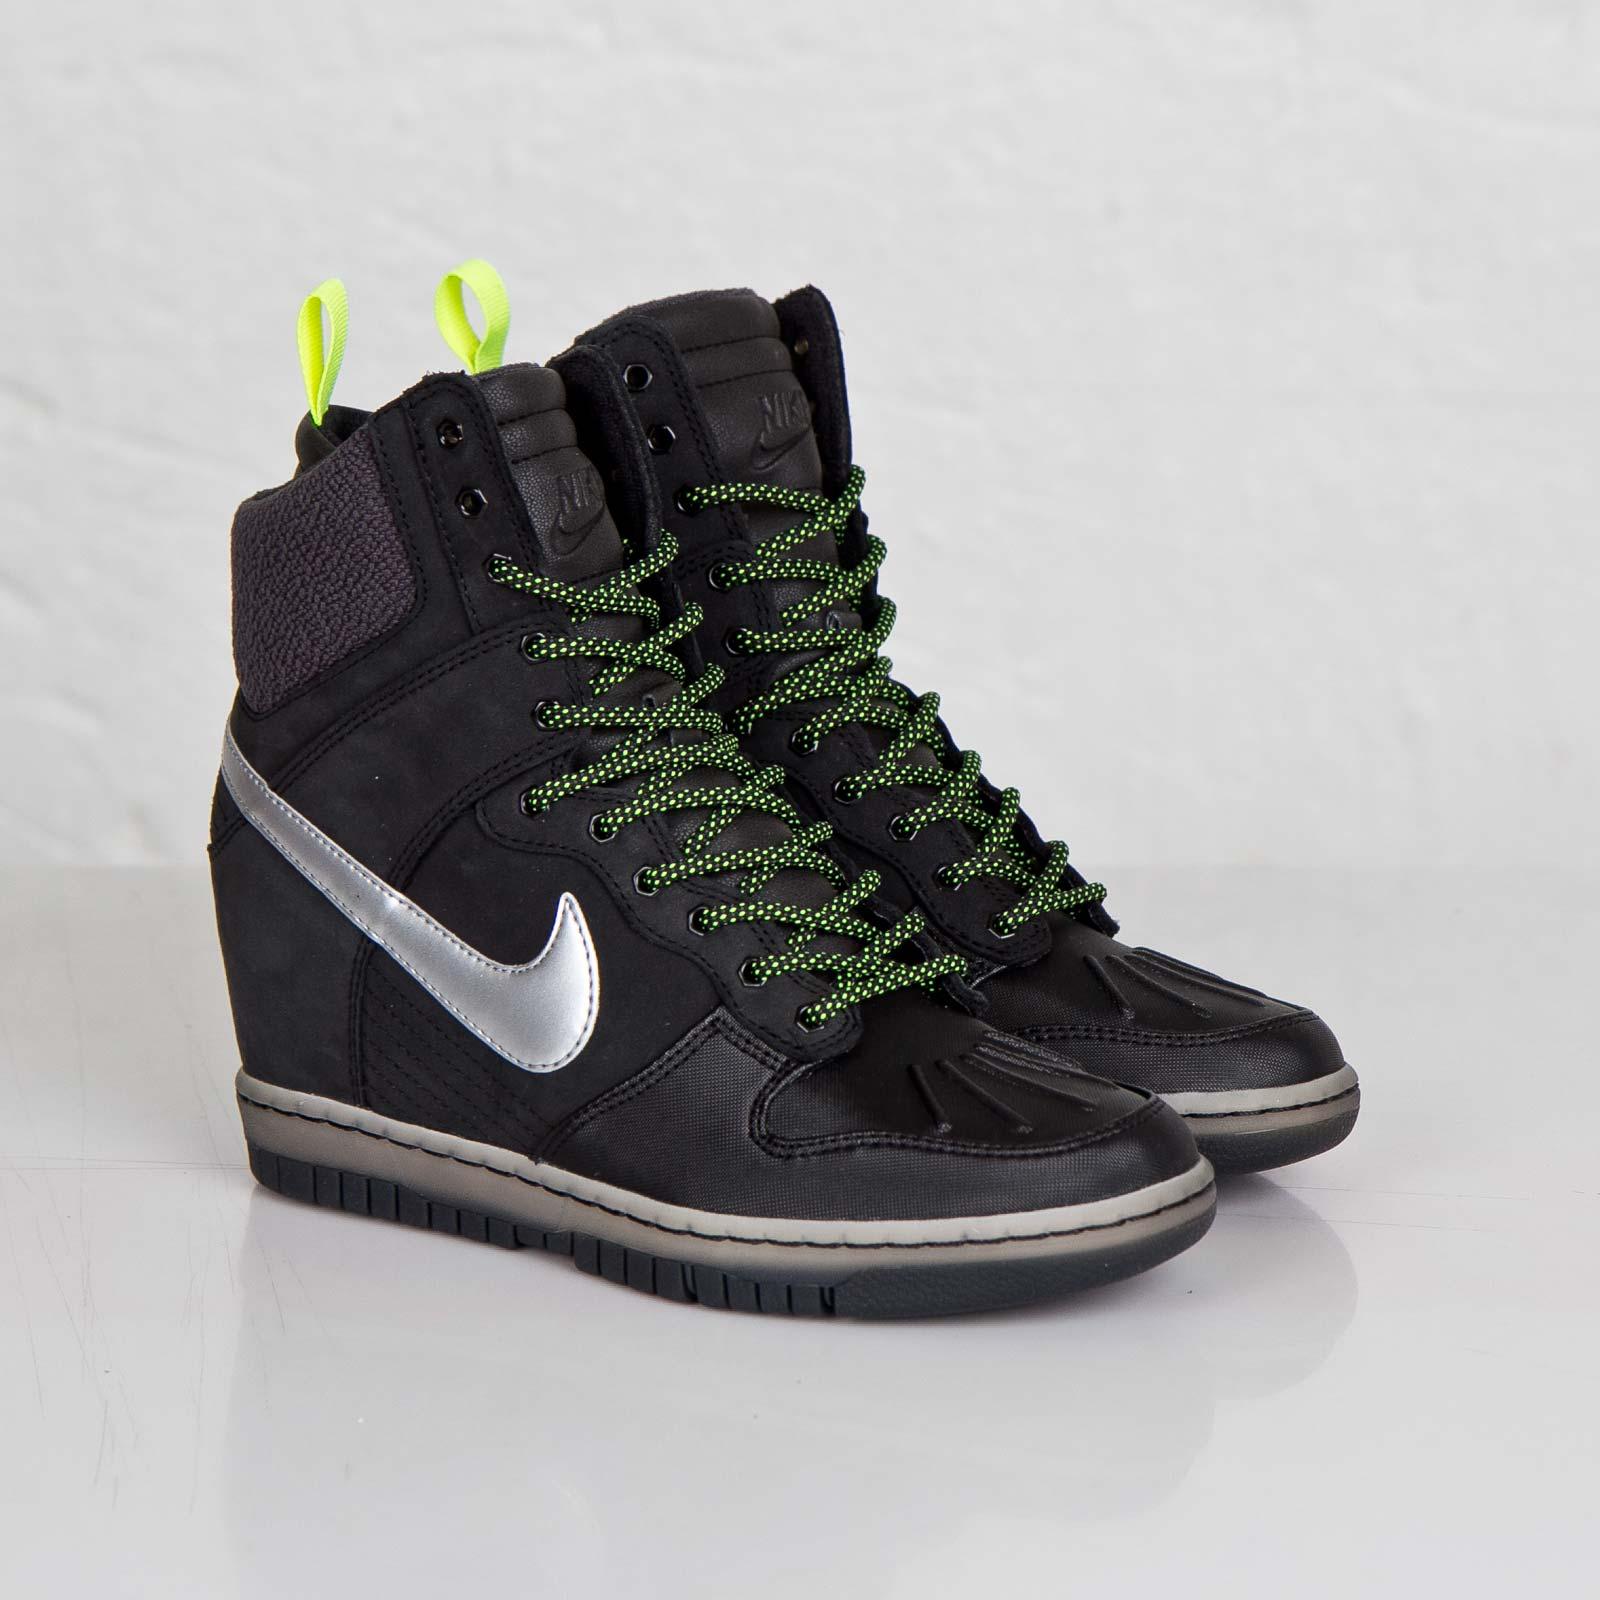 bb7994e42646 ... australia nike wmns dunk sky hi sneakerboot 2.0 44481 b60f5 ...